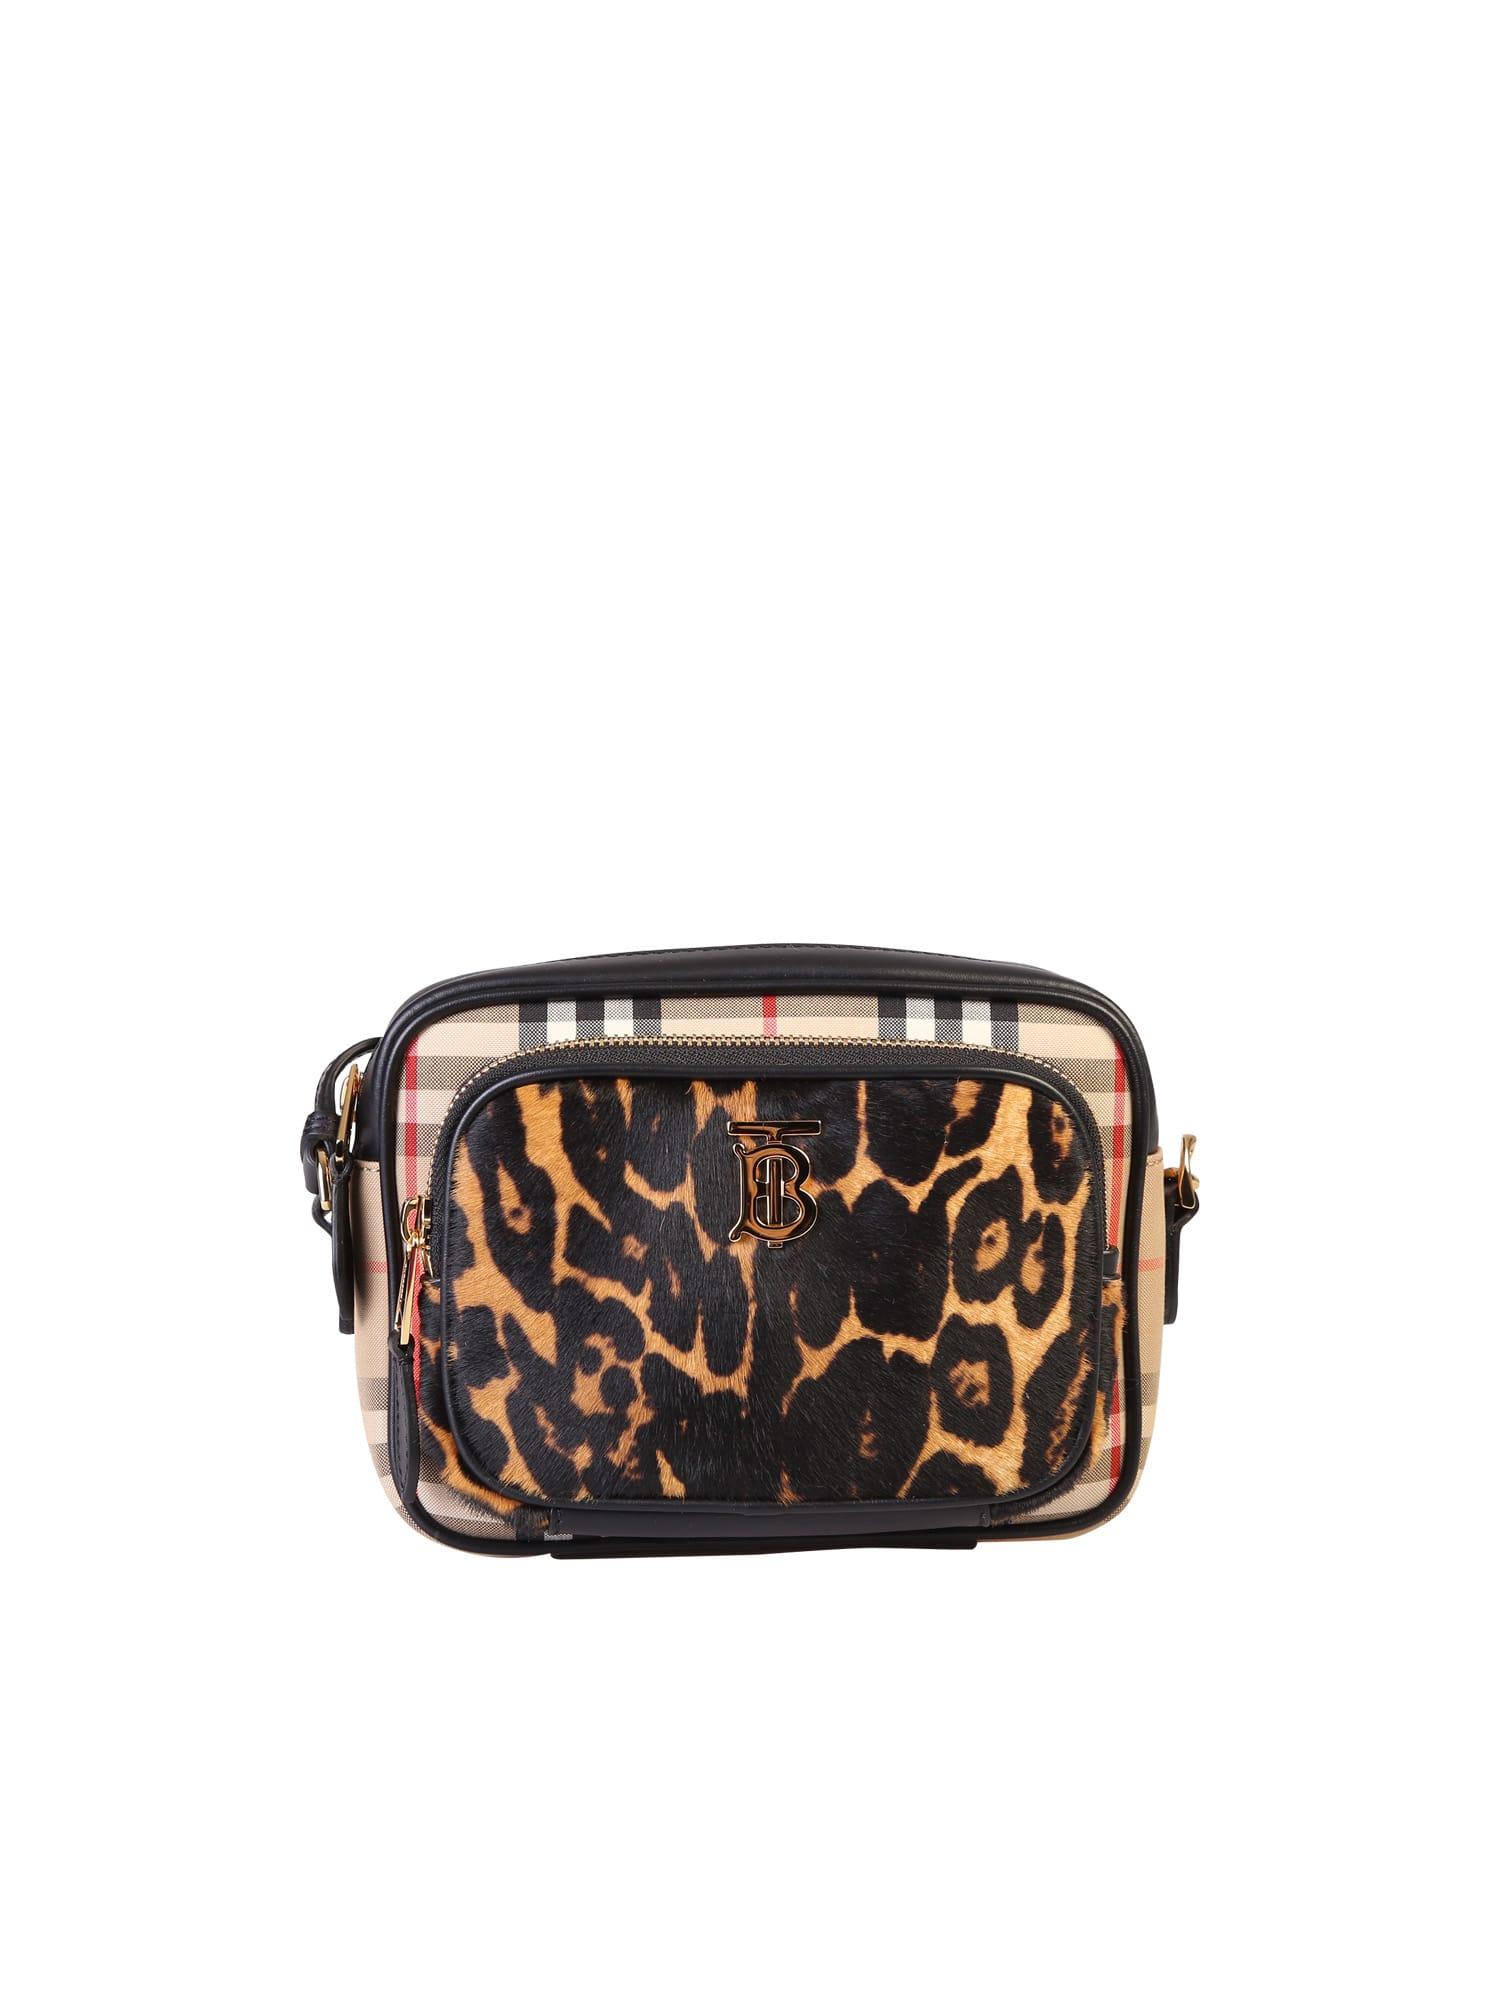 Burberry Leopard Print Camera Bag In Black